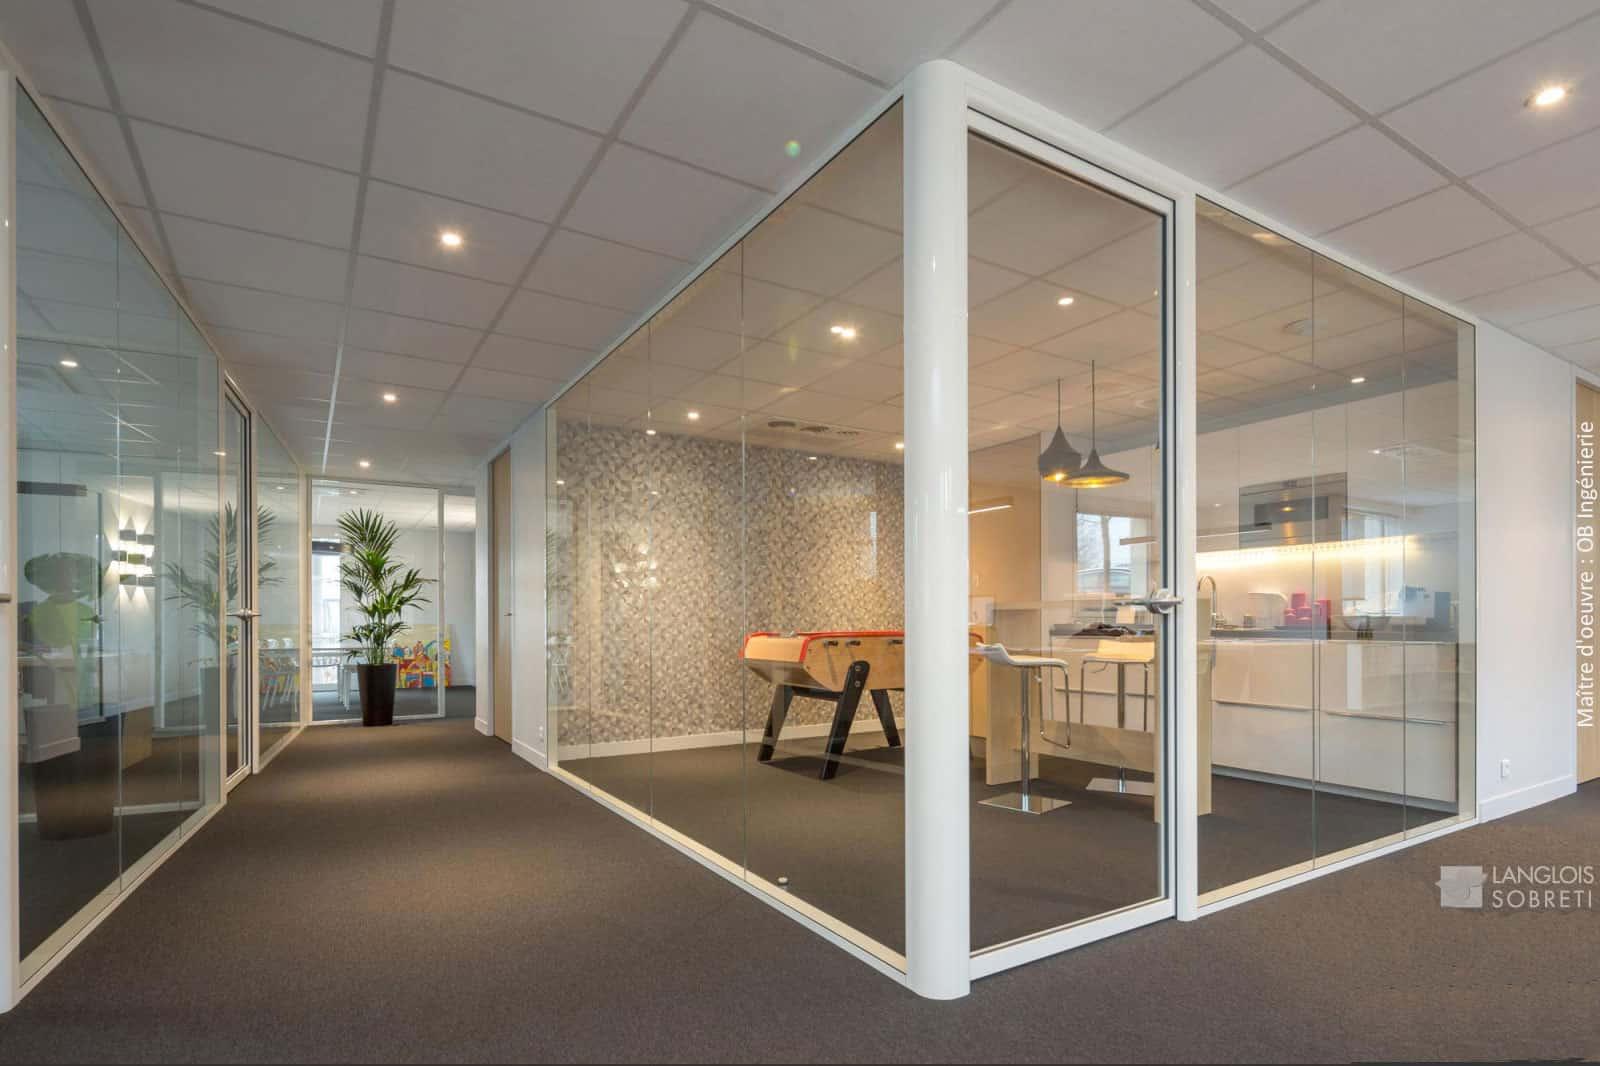 mobilier de bureau - cloisons modulaires - (Caen - Calvados - 14 en Normandie)